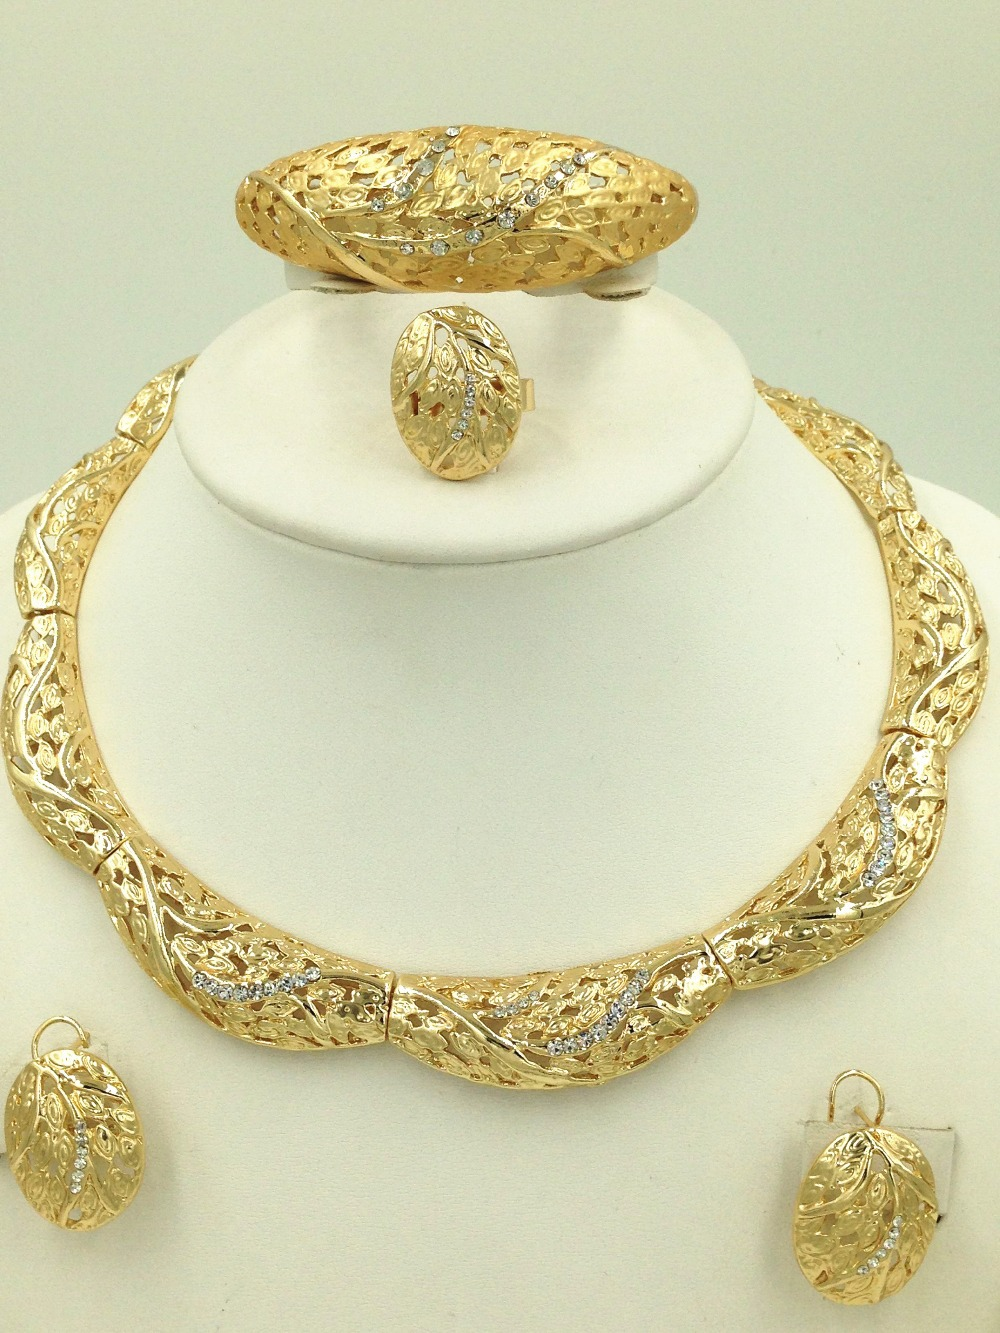 Unusual Dubai Haram Designs Gallery - Jewelry Collection Ideas ...